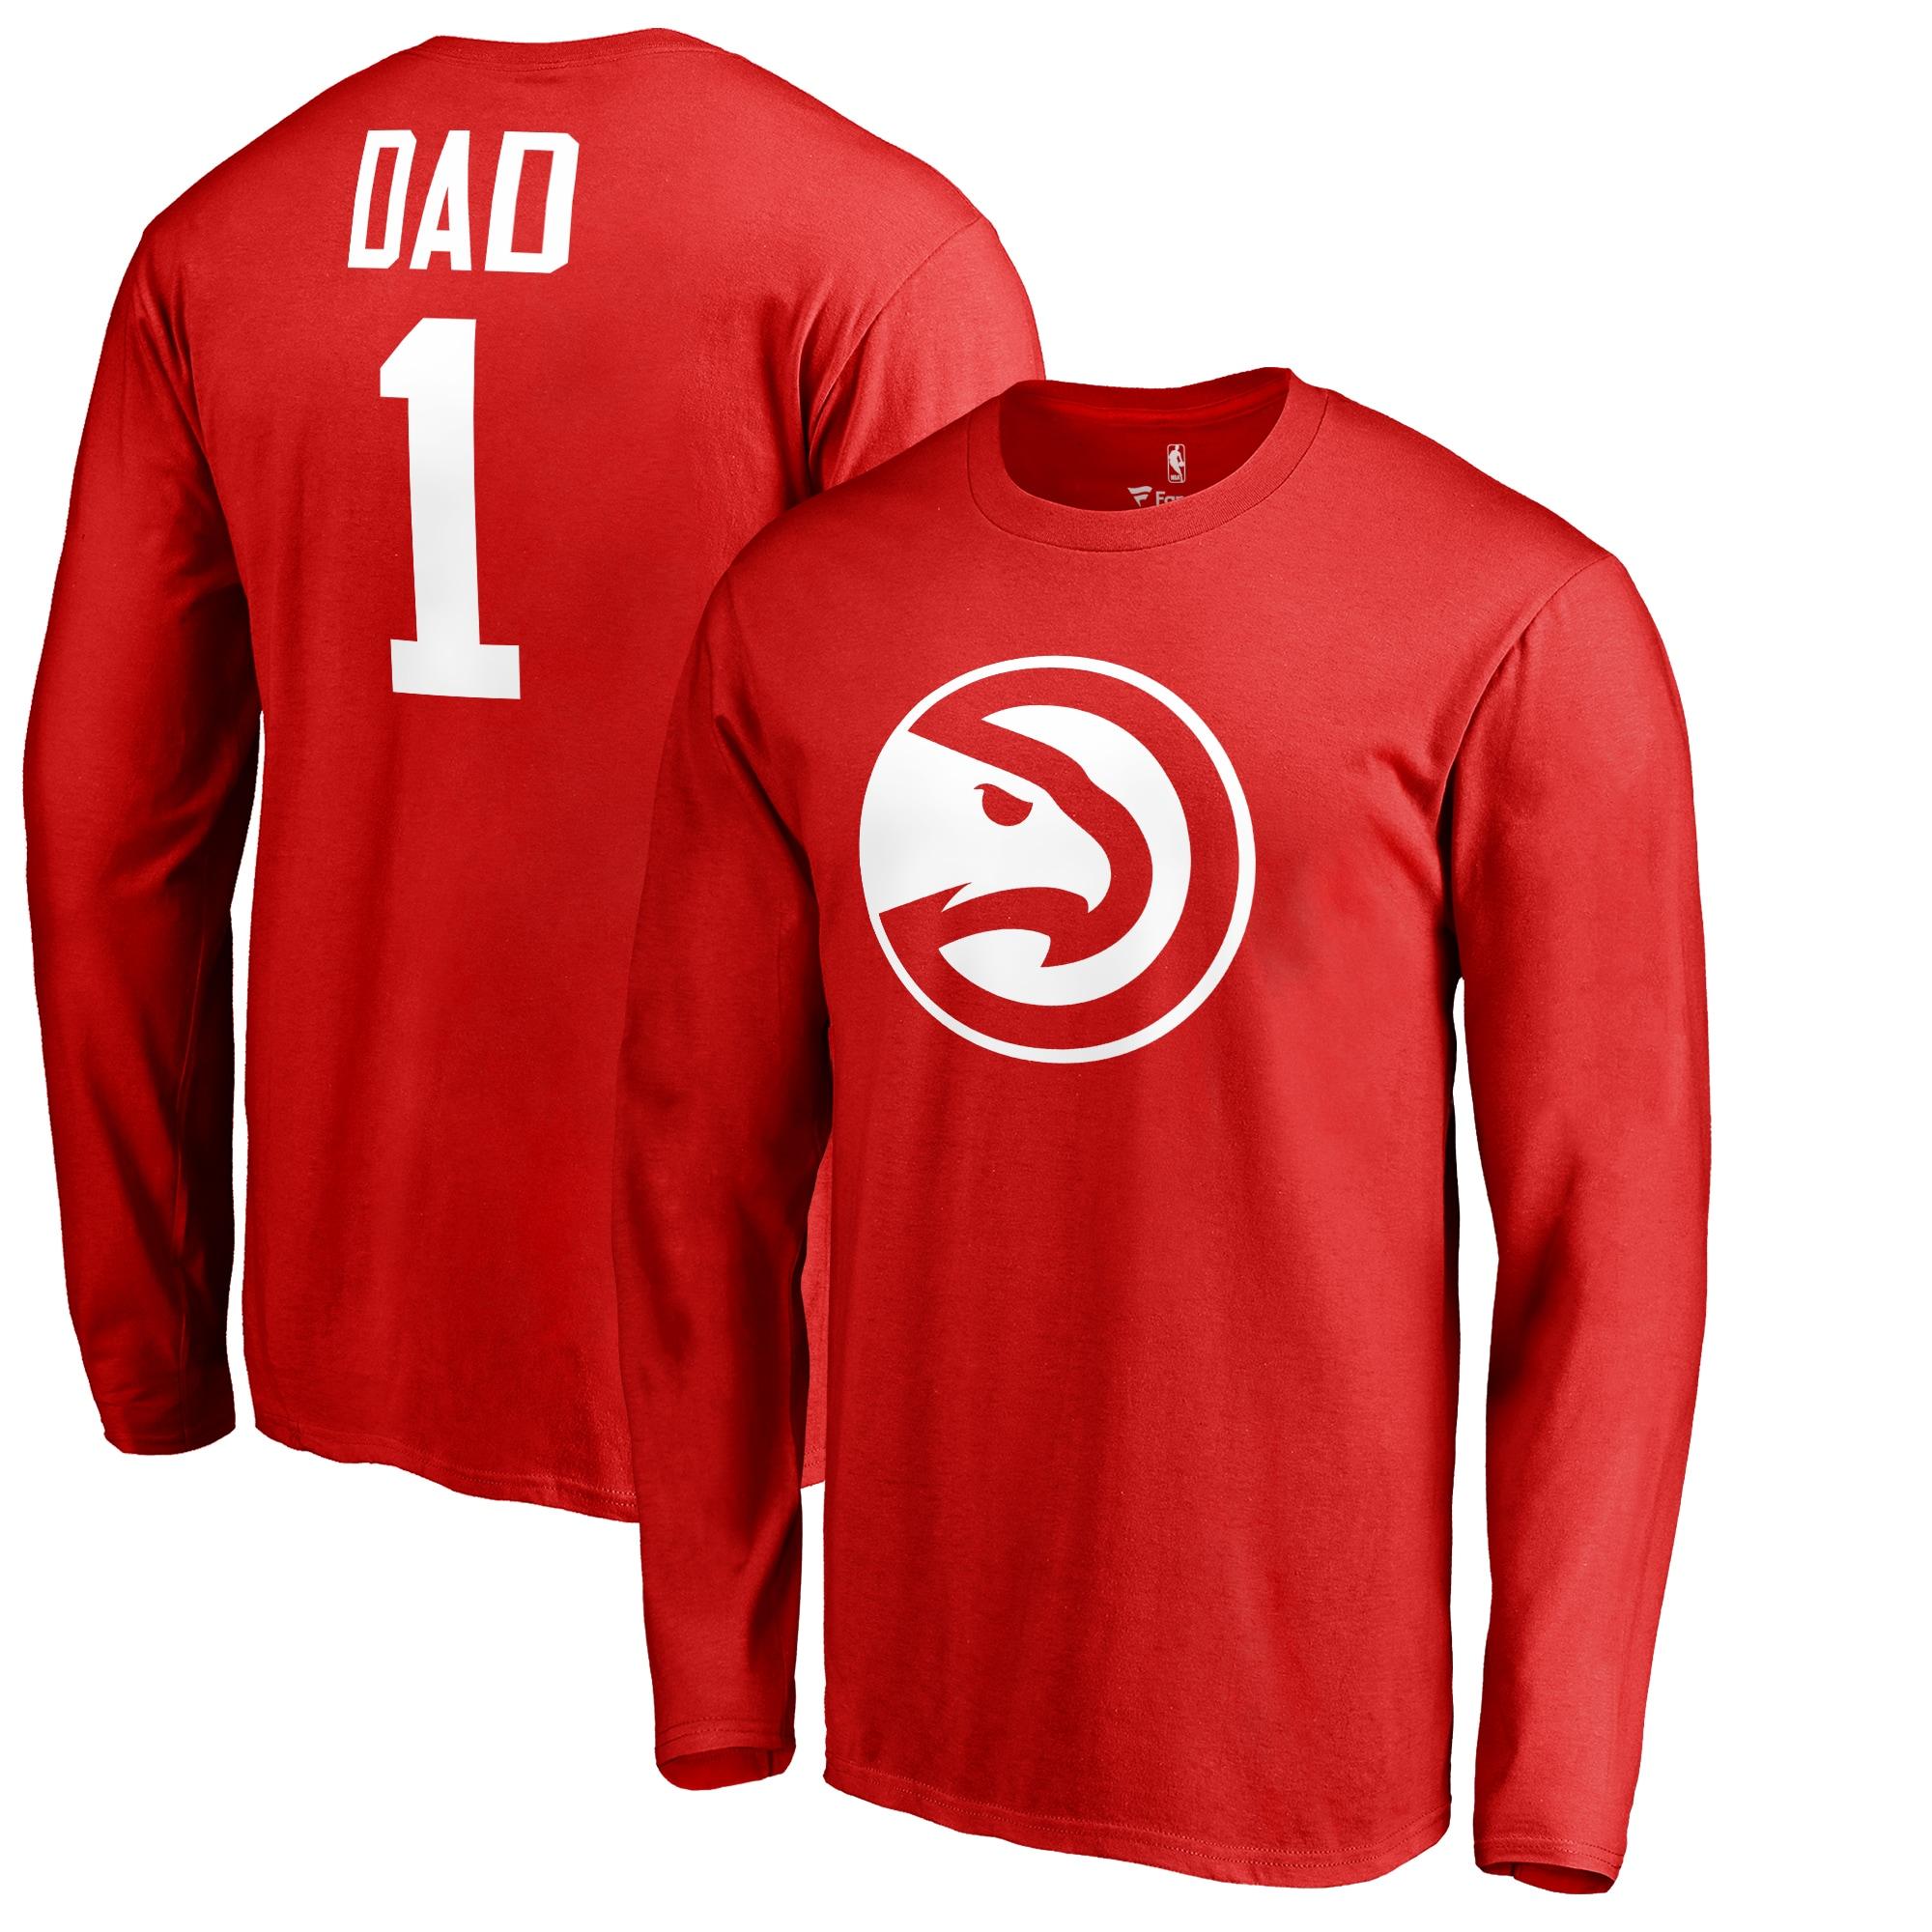 Atlanta Hawks Fanatics Branded Big & Tall #1 Dad Long Sleeve T-Shirt - Red